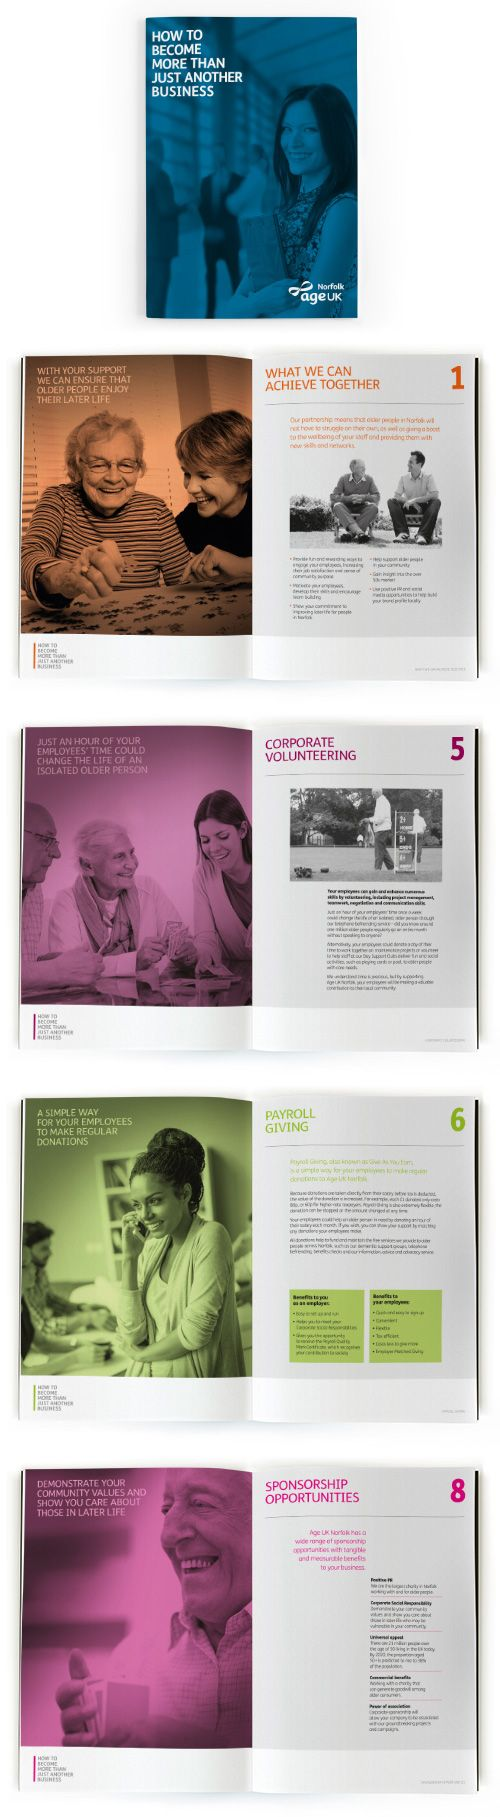 Corporate Fundraising Brochure Design – Age UK. Robot Mascot